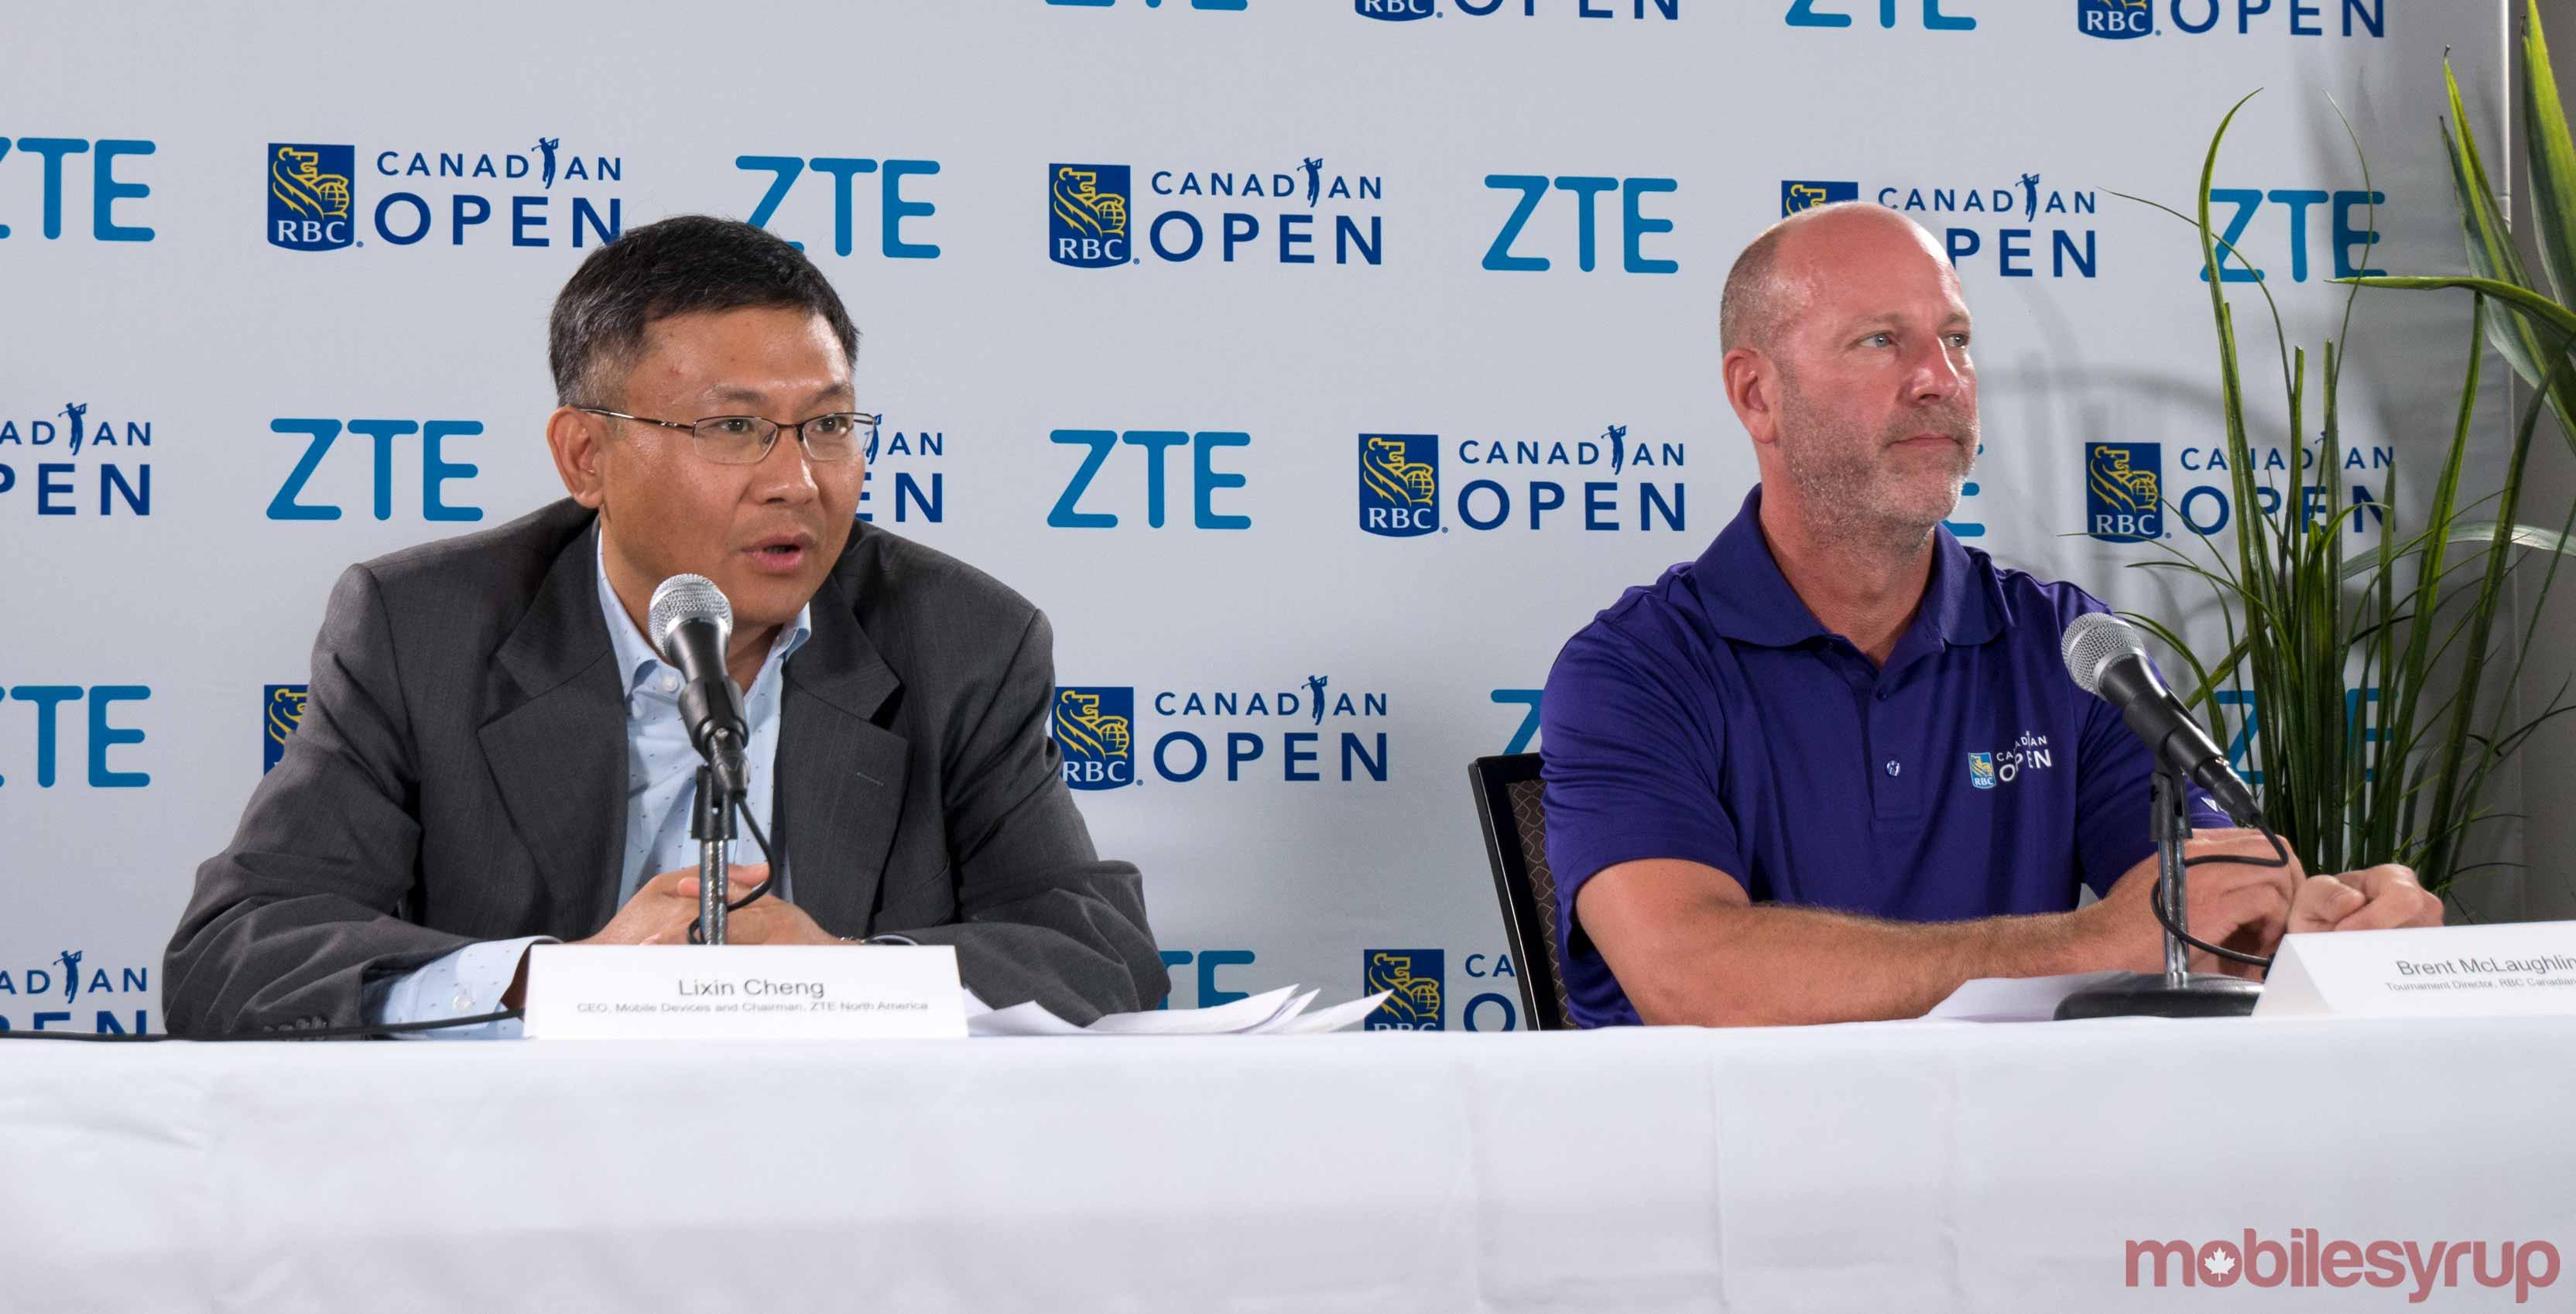 ZTE Canadian Open